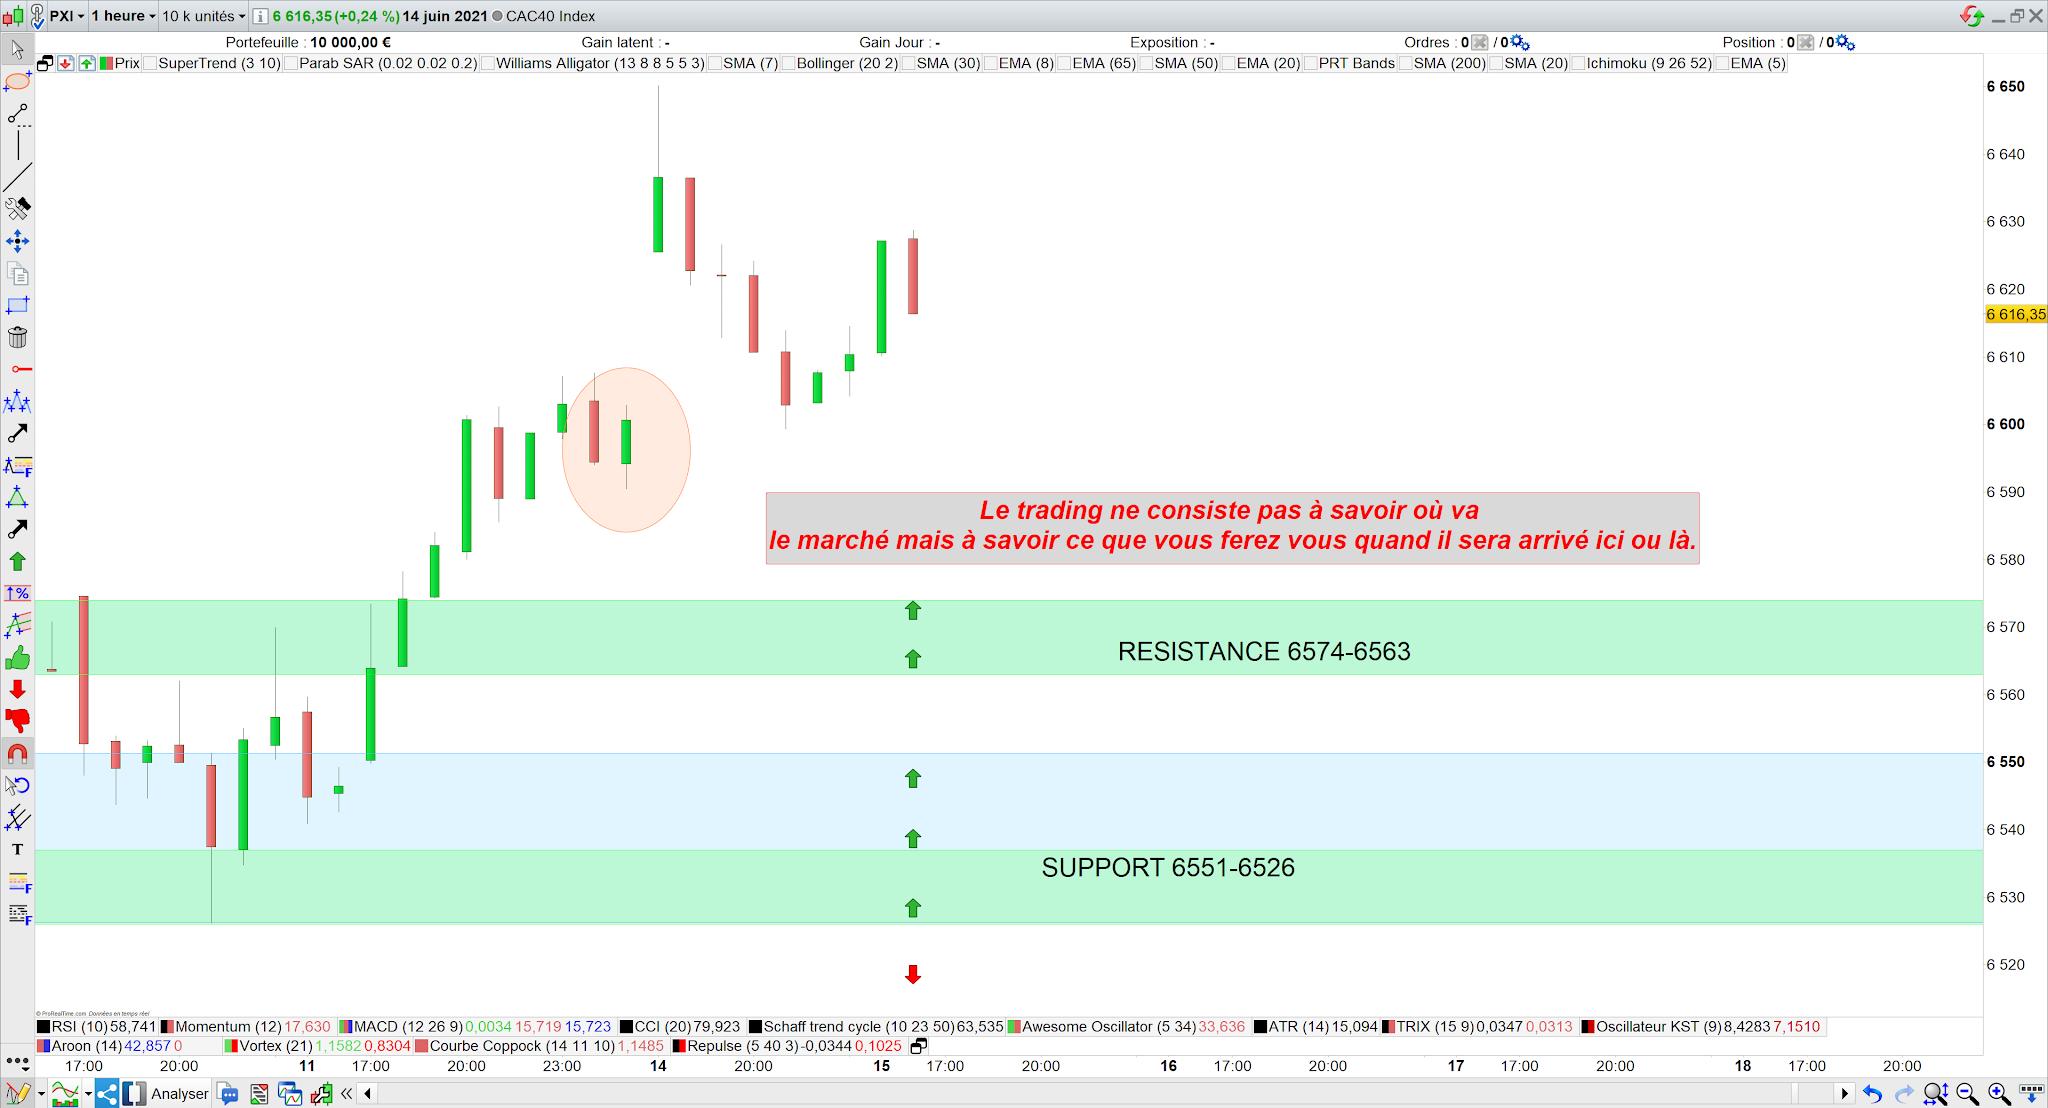 Bilan trading cac40 14 juin 21